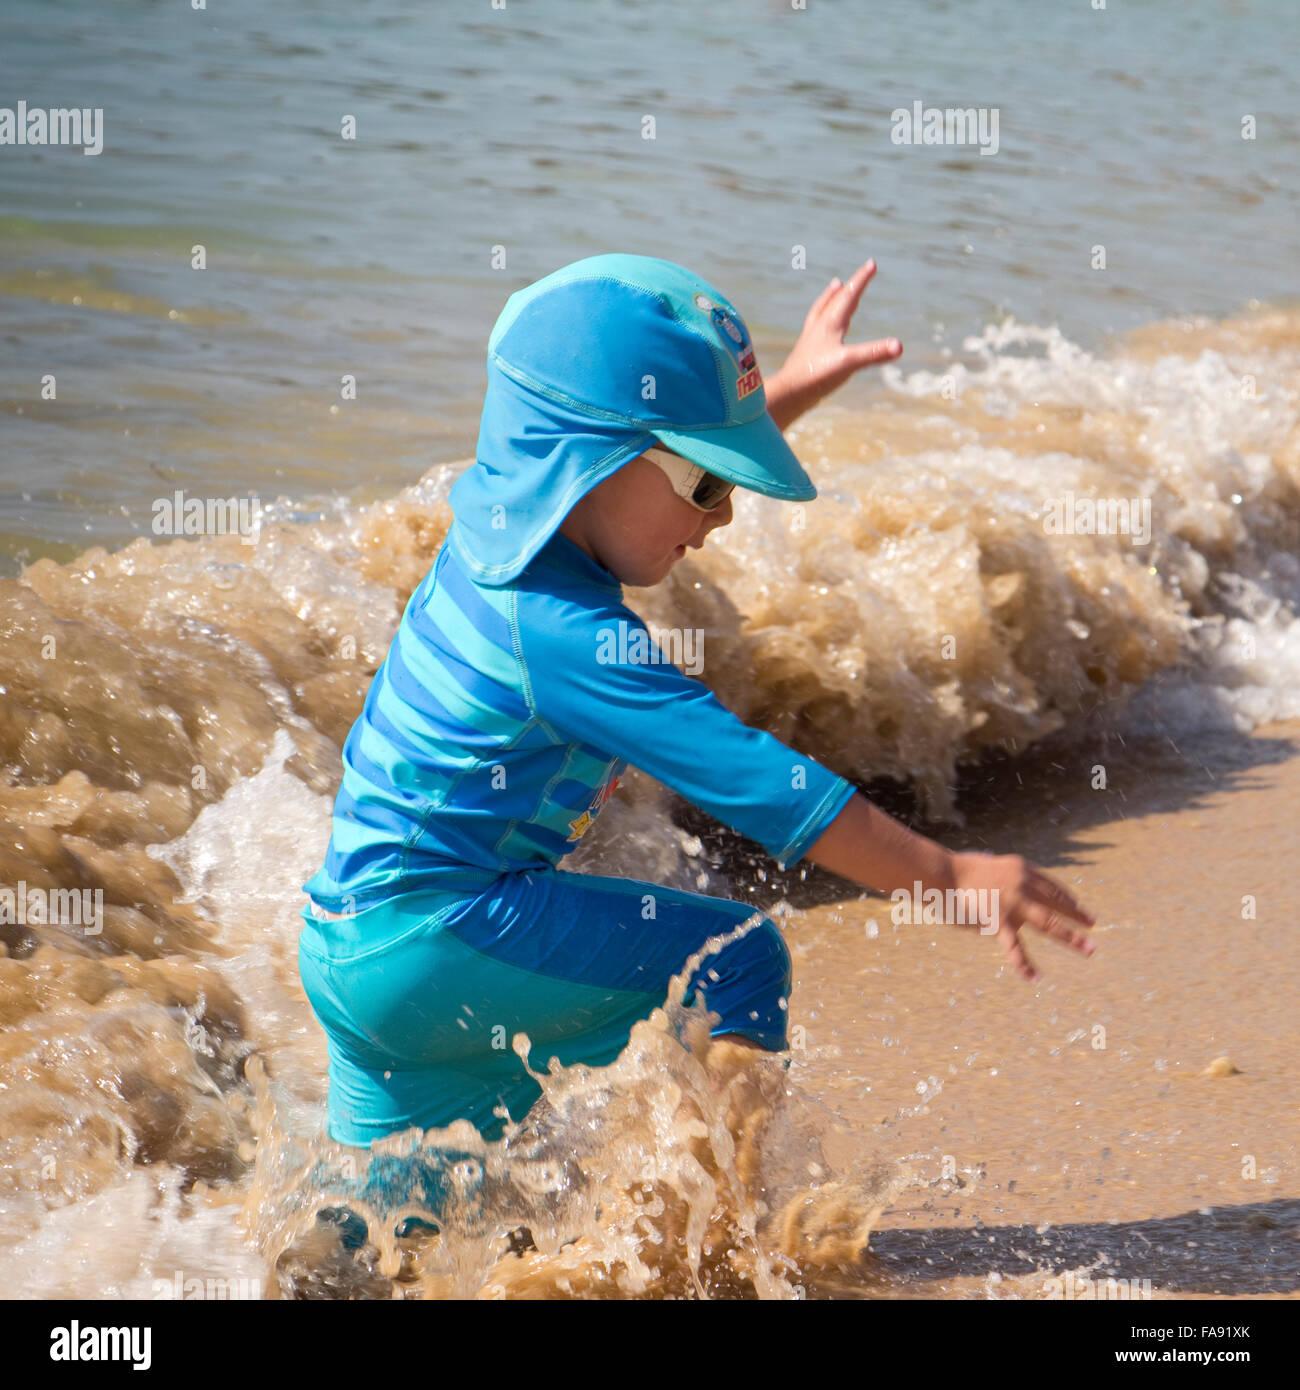 Boy playing on the beach at Praia De Santa Eulalia, near Albufeira, Algarve, Portugal Stock Photo